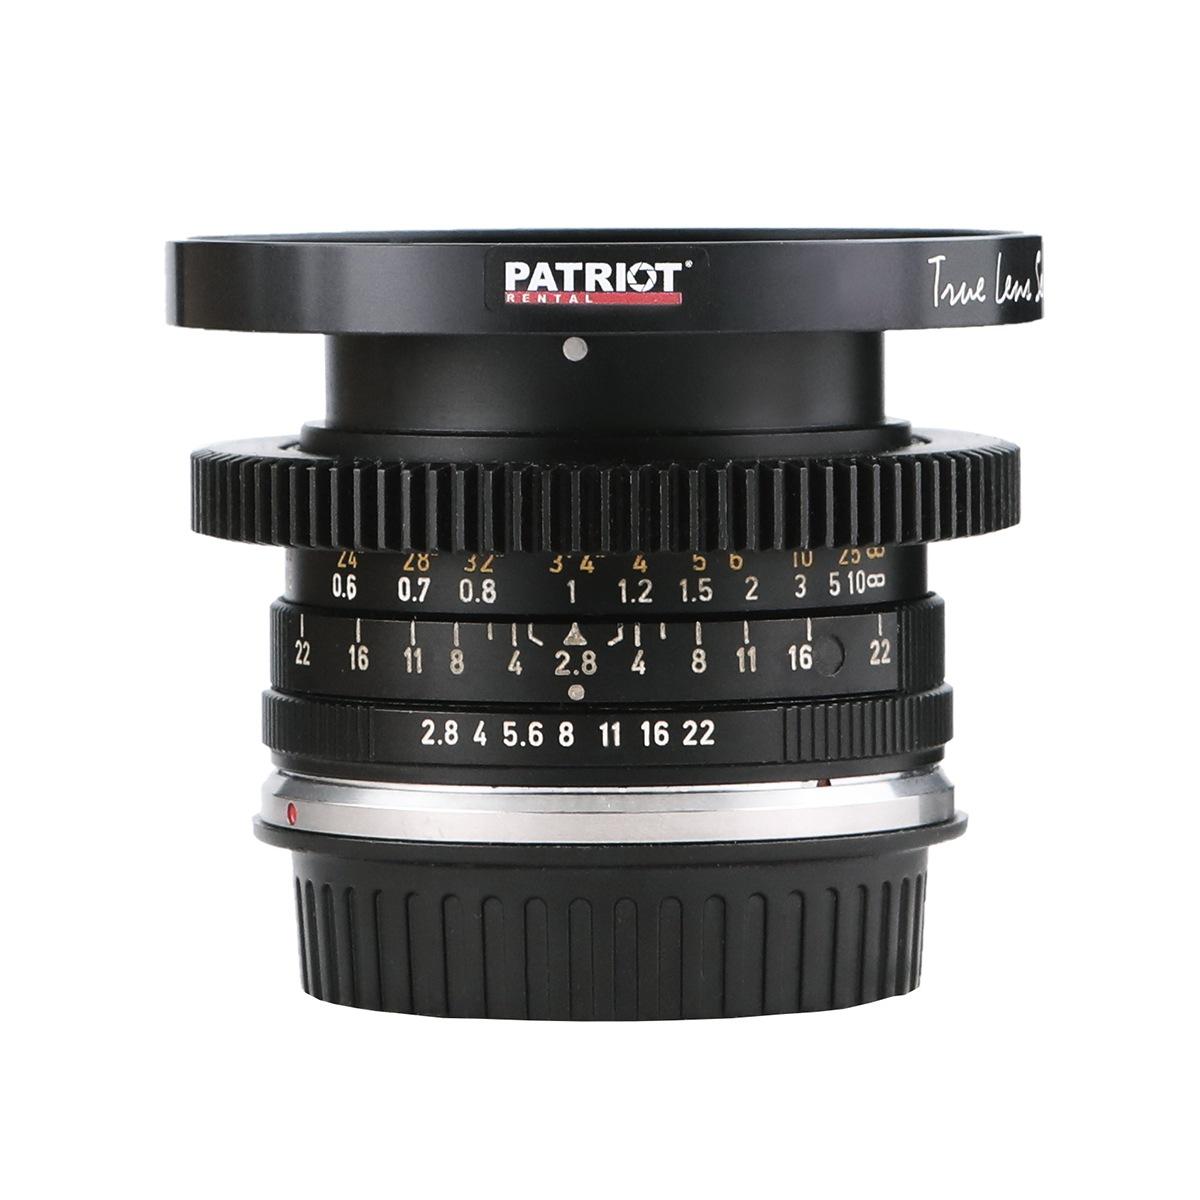 28mm LEICA-R EF Lens T2.8